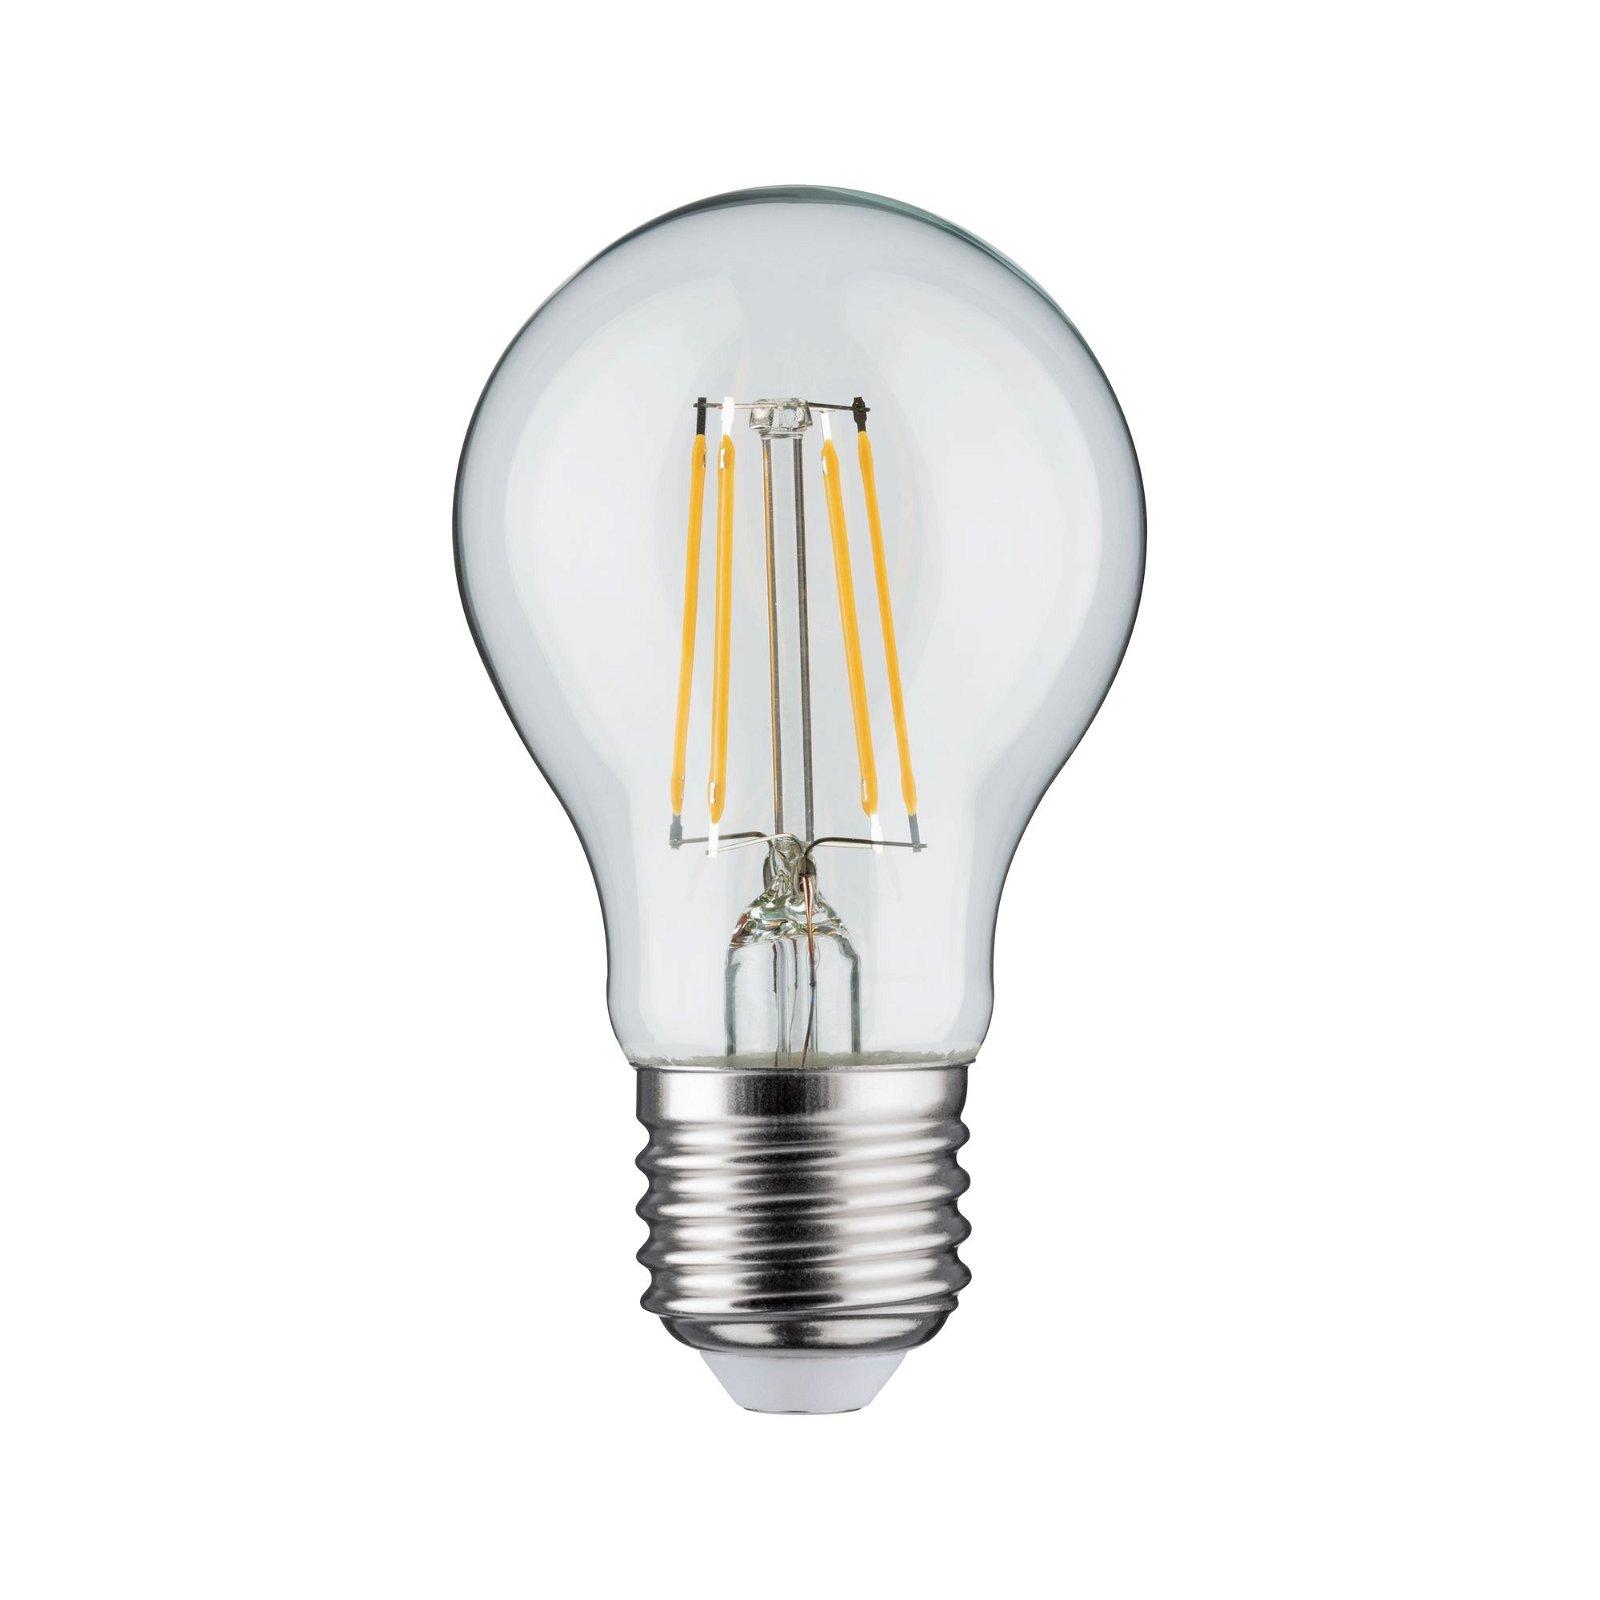 LED-gloeilamp Filament E27 230V 470lm 4,5W 2700K Helder